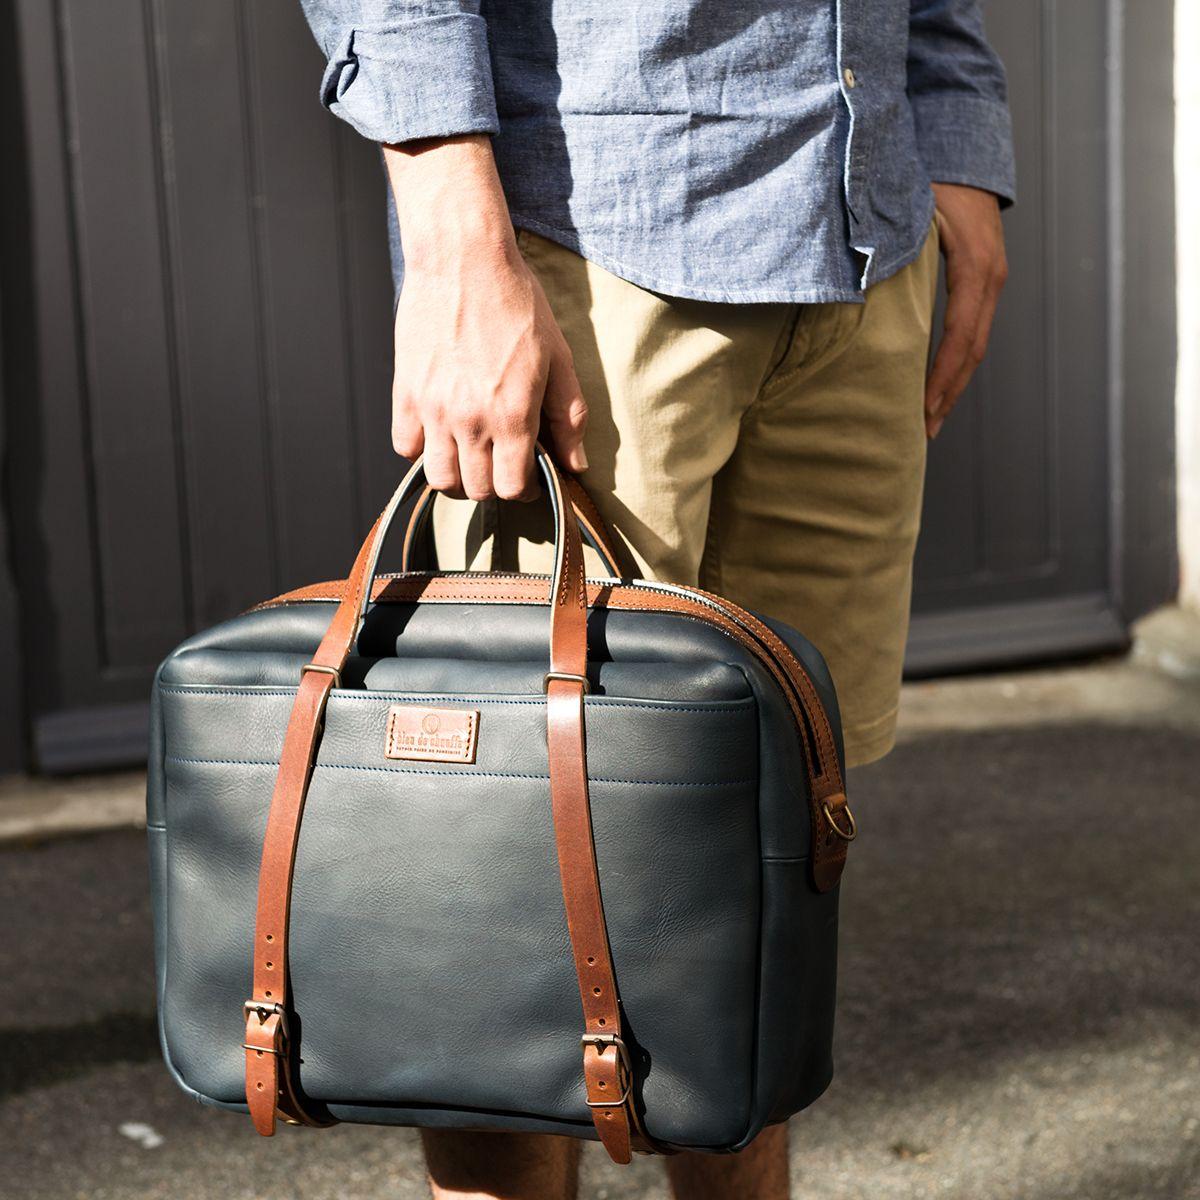 dff004e3cae Bleu de Chauffe - Business bag Report